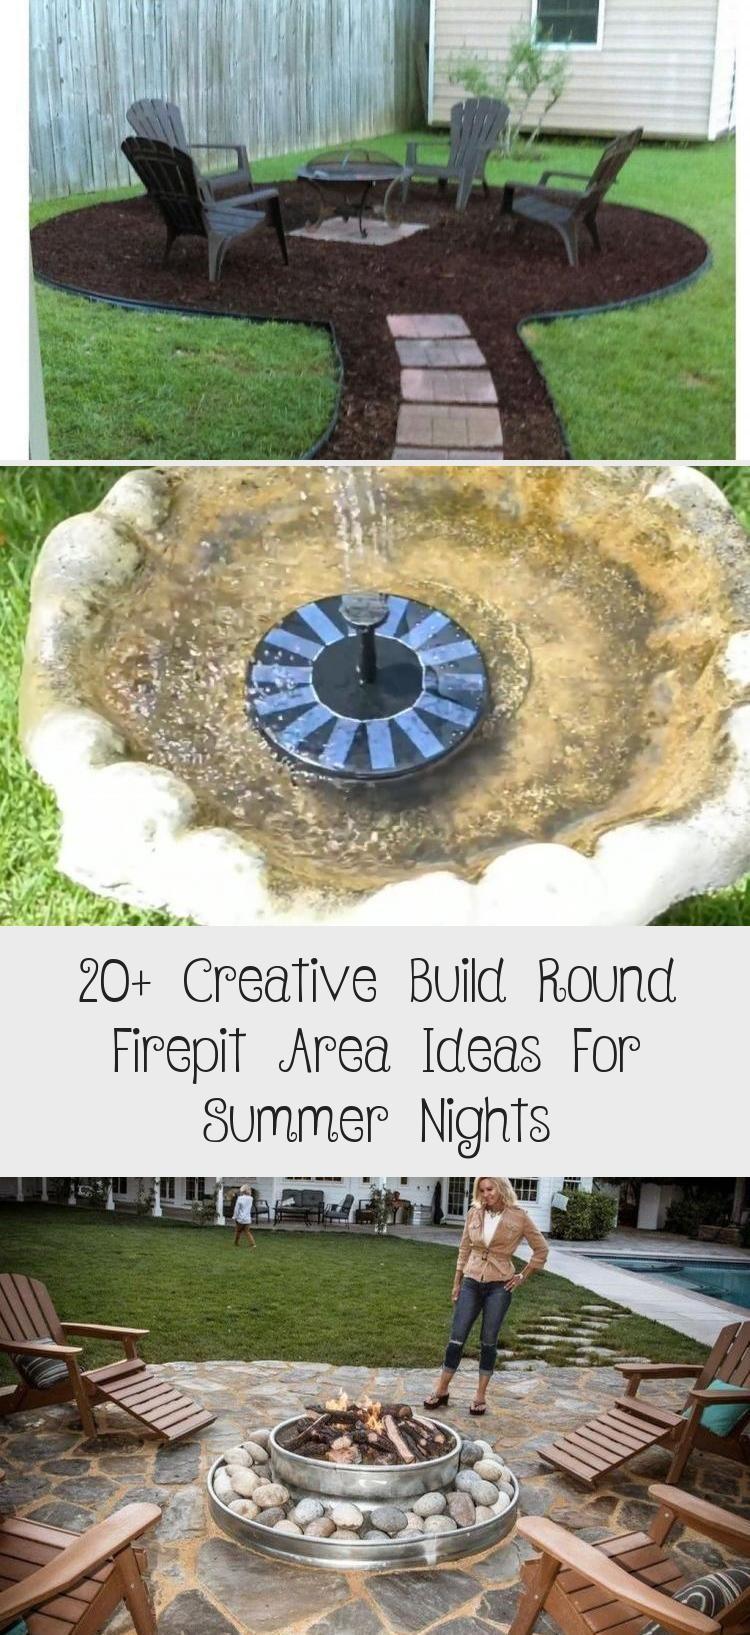 Photo of 20+ Creative Build Round Firepit Area Ideas For Summer Nights – GARDEN